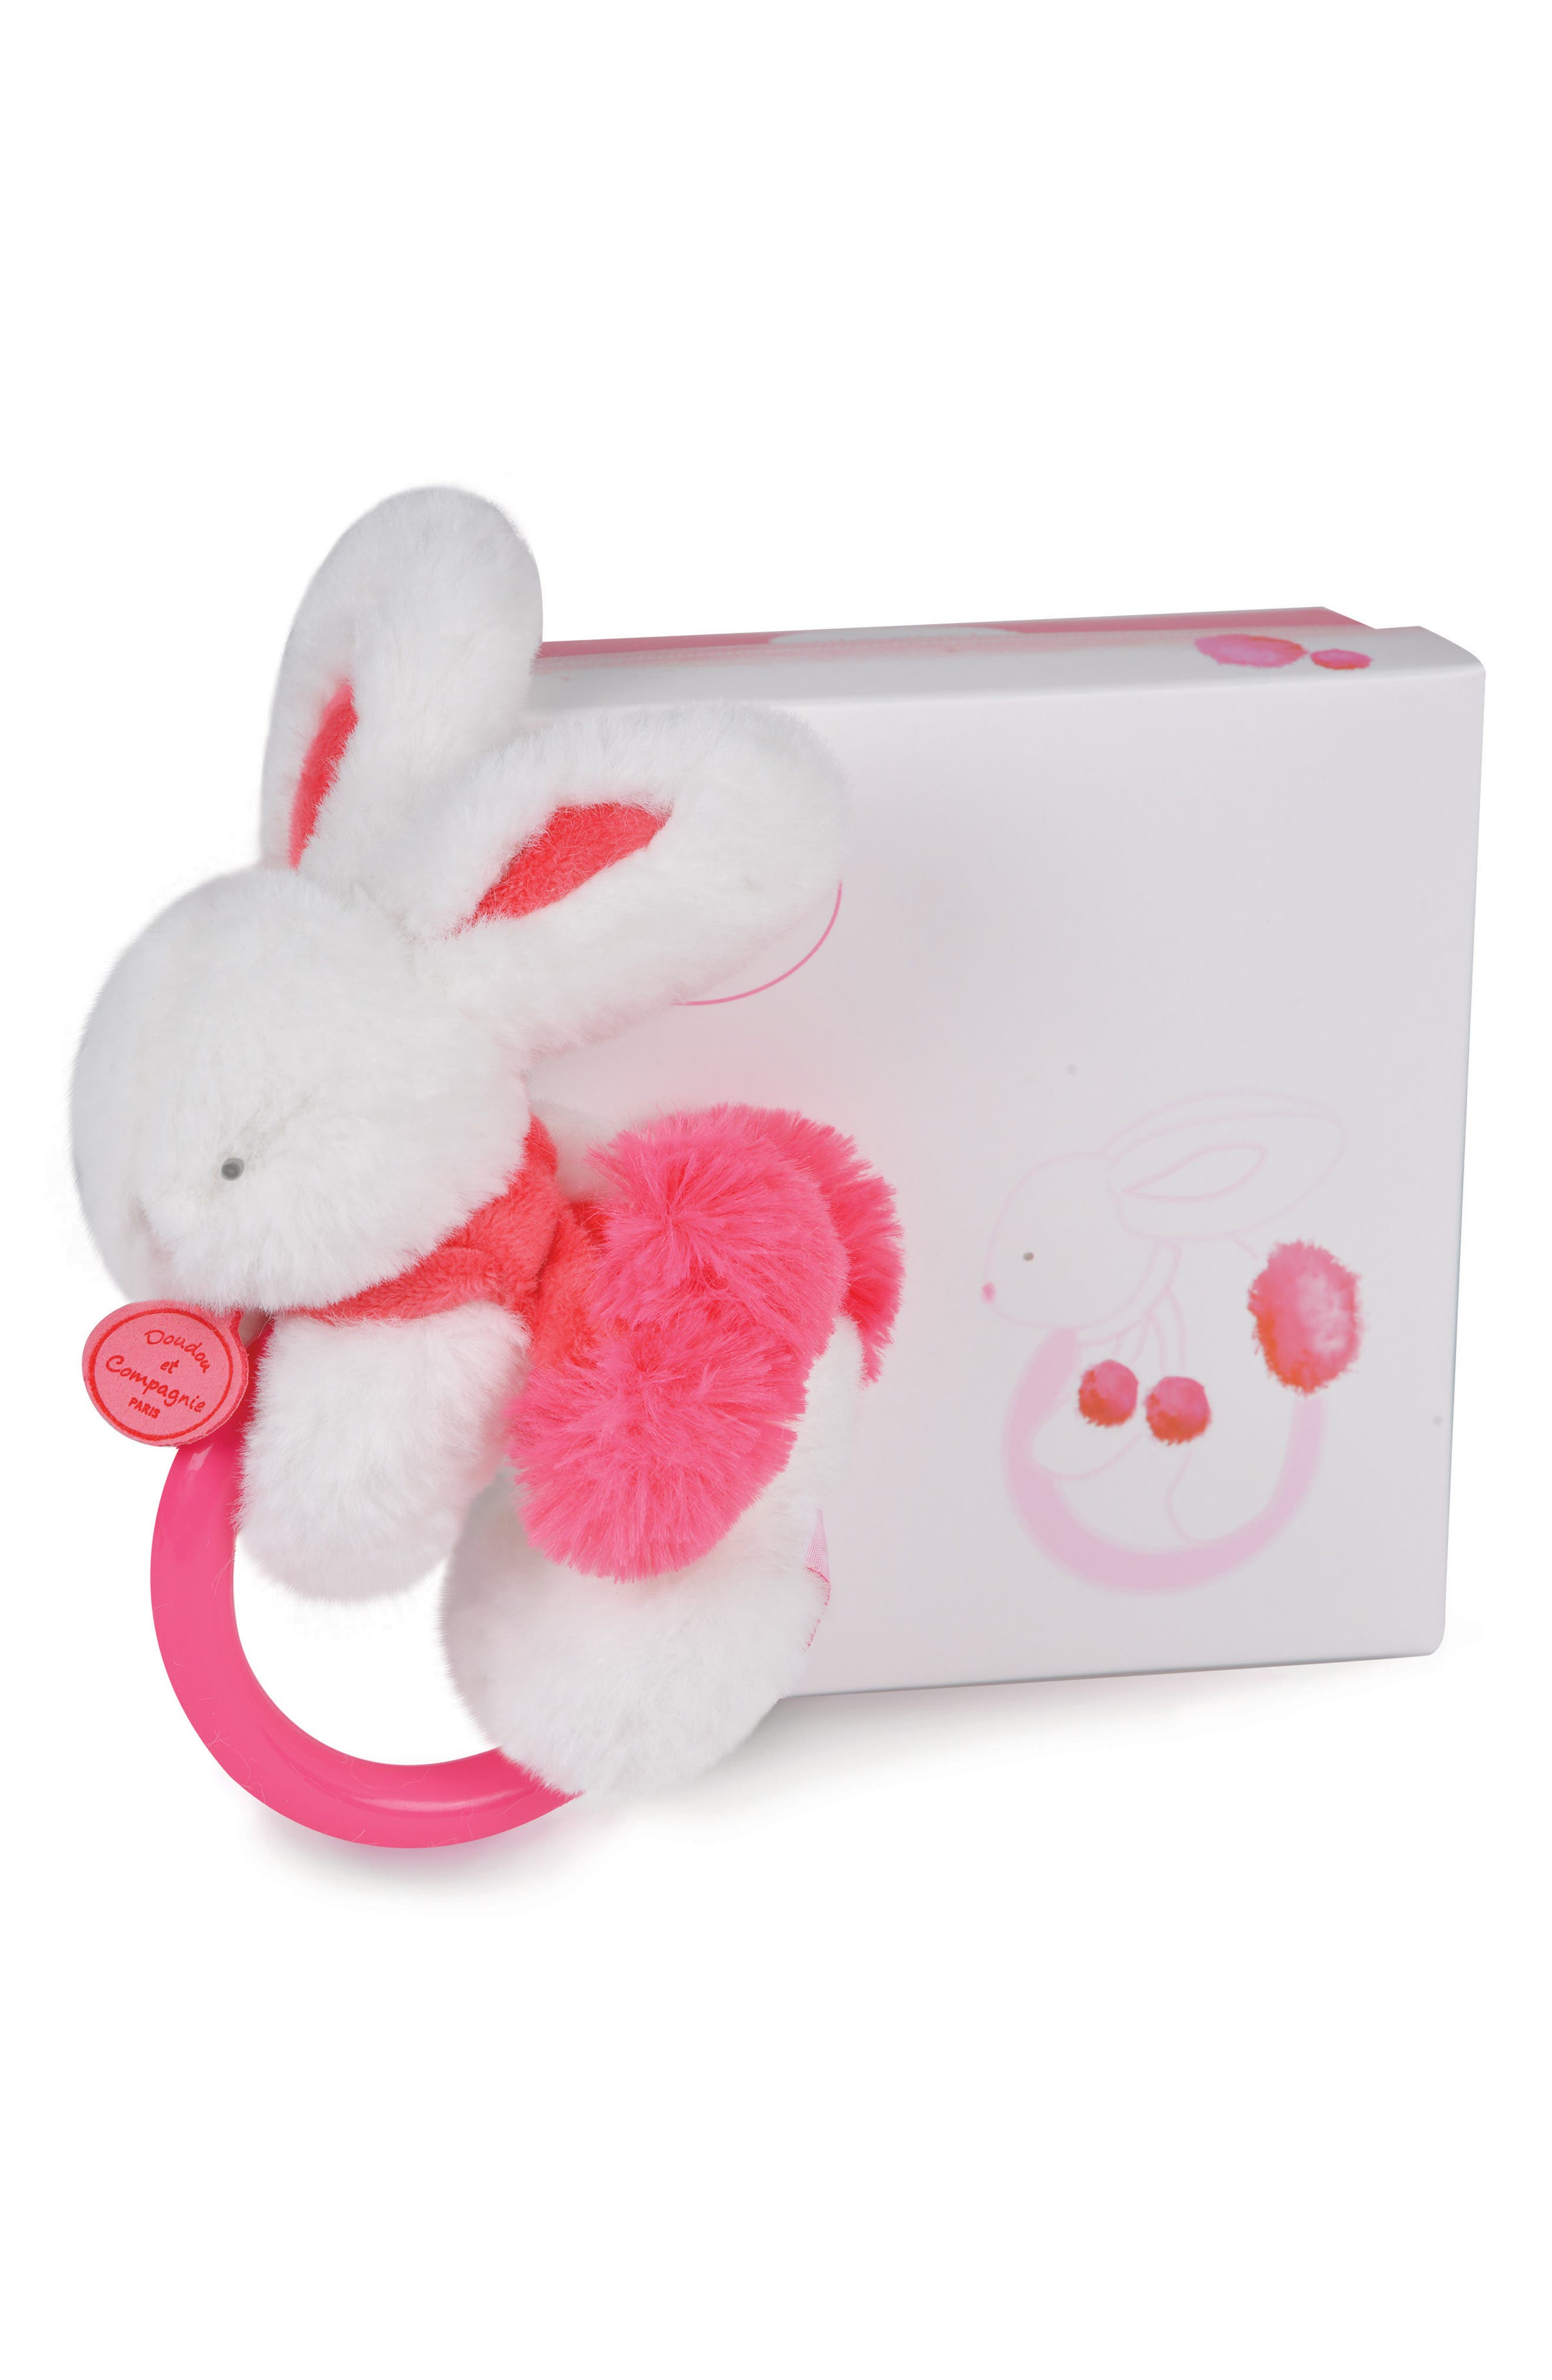 Strawberry Pink Bunny Rattle & Lovie Blanket Gift Set,                             Alternate thumbnail 2, color,                             650